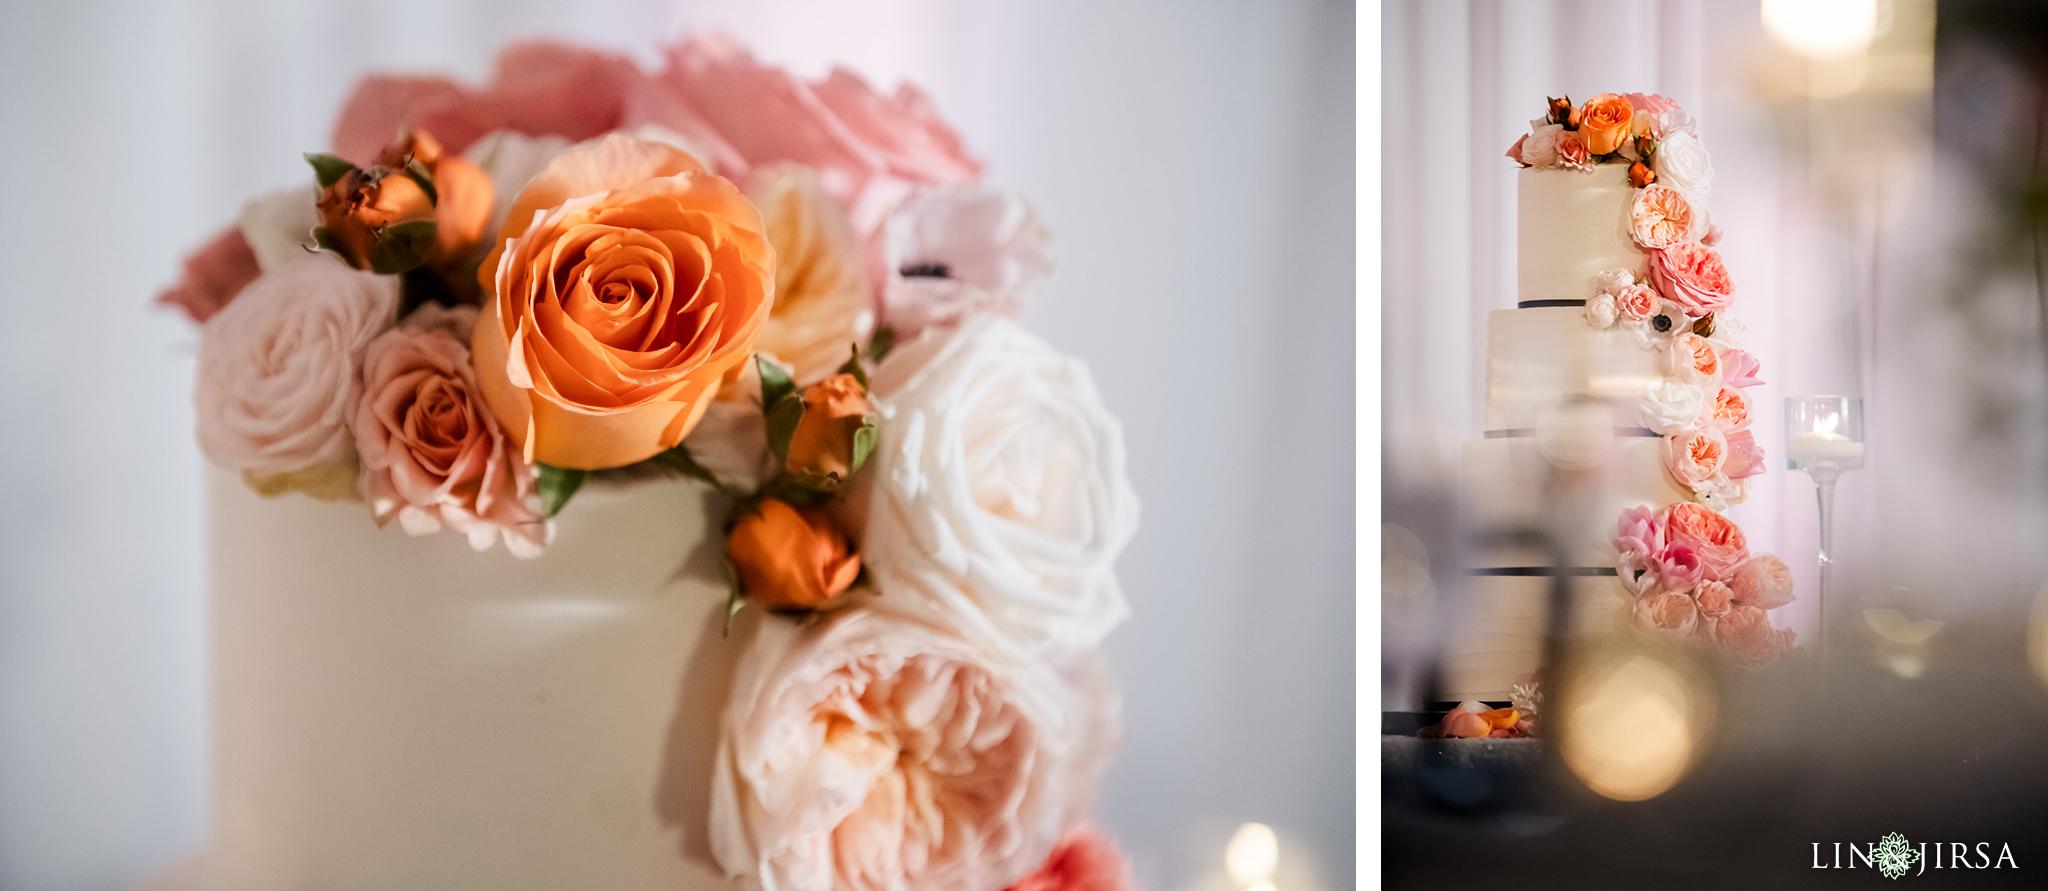 30 The Waterfront Beach Resort Orange County Indian Wedding Photography